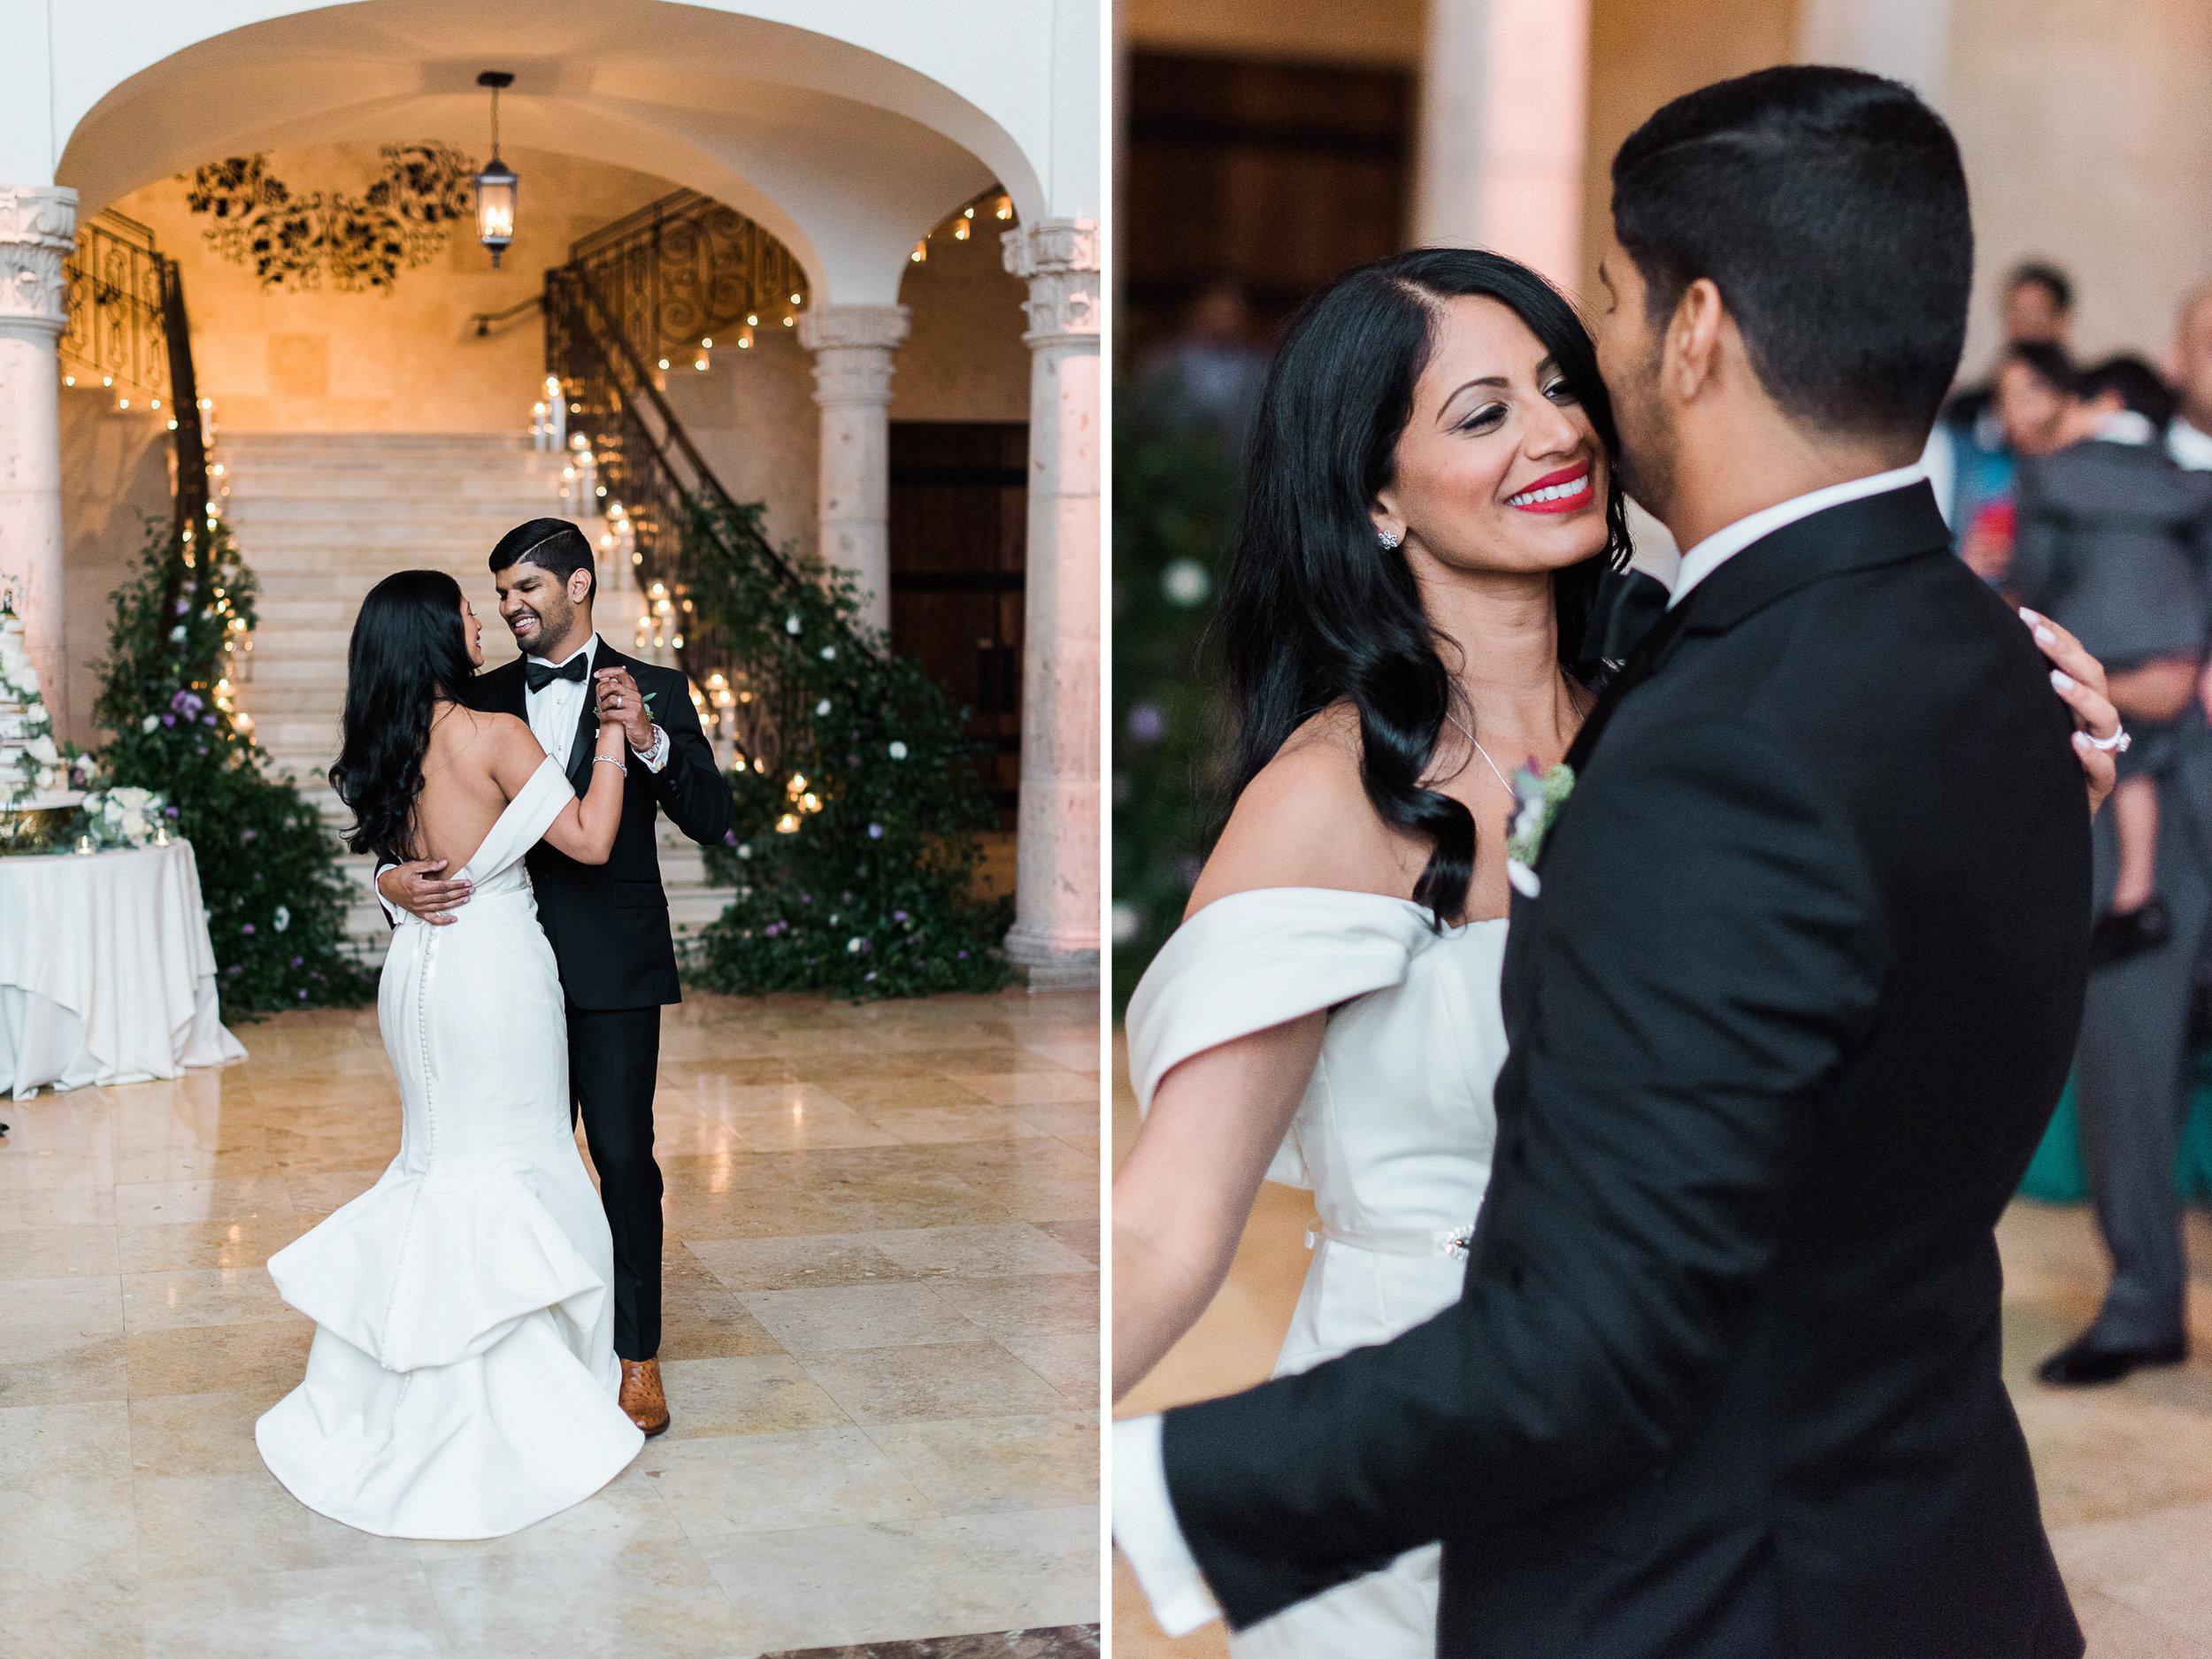 Fine-Art-Film-Houston-Wedding-Photographer-Best-Top-Luxury-Texas-Austin-Dallas-Destination-Dana-Fernandez-Photography-The-Bell-Tower-on-34th-Indian-9-201.jpg